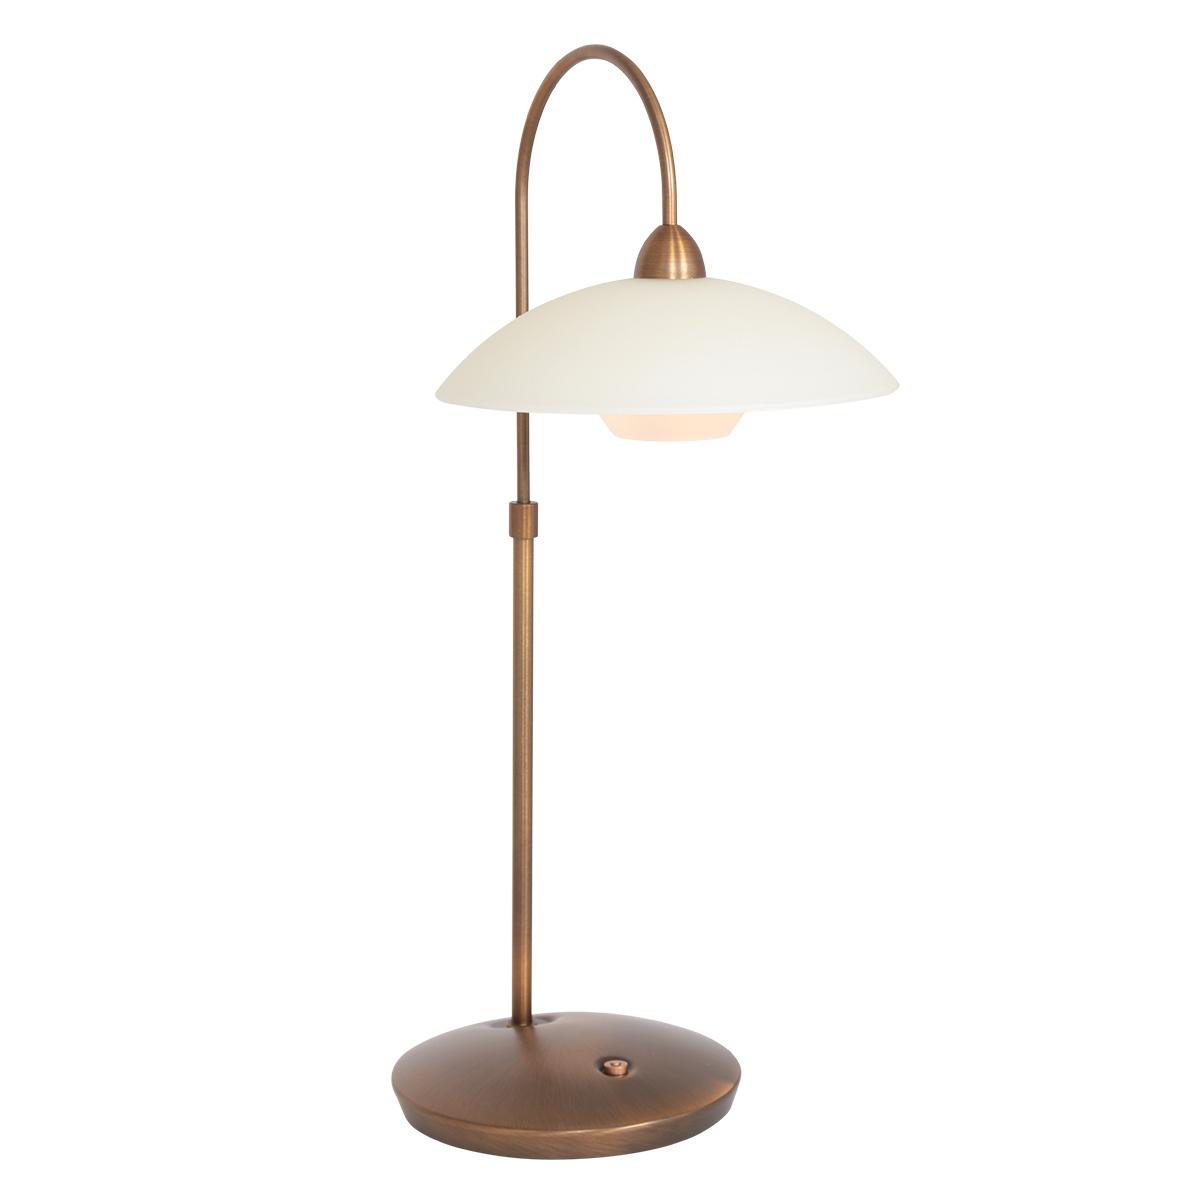 Steinhauer Tafellamp sovereign classic LED 2742br brons